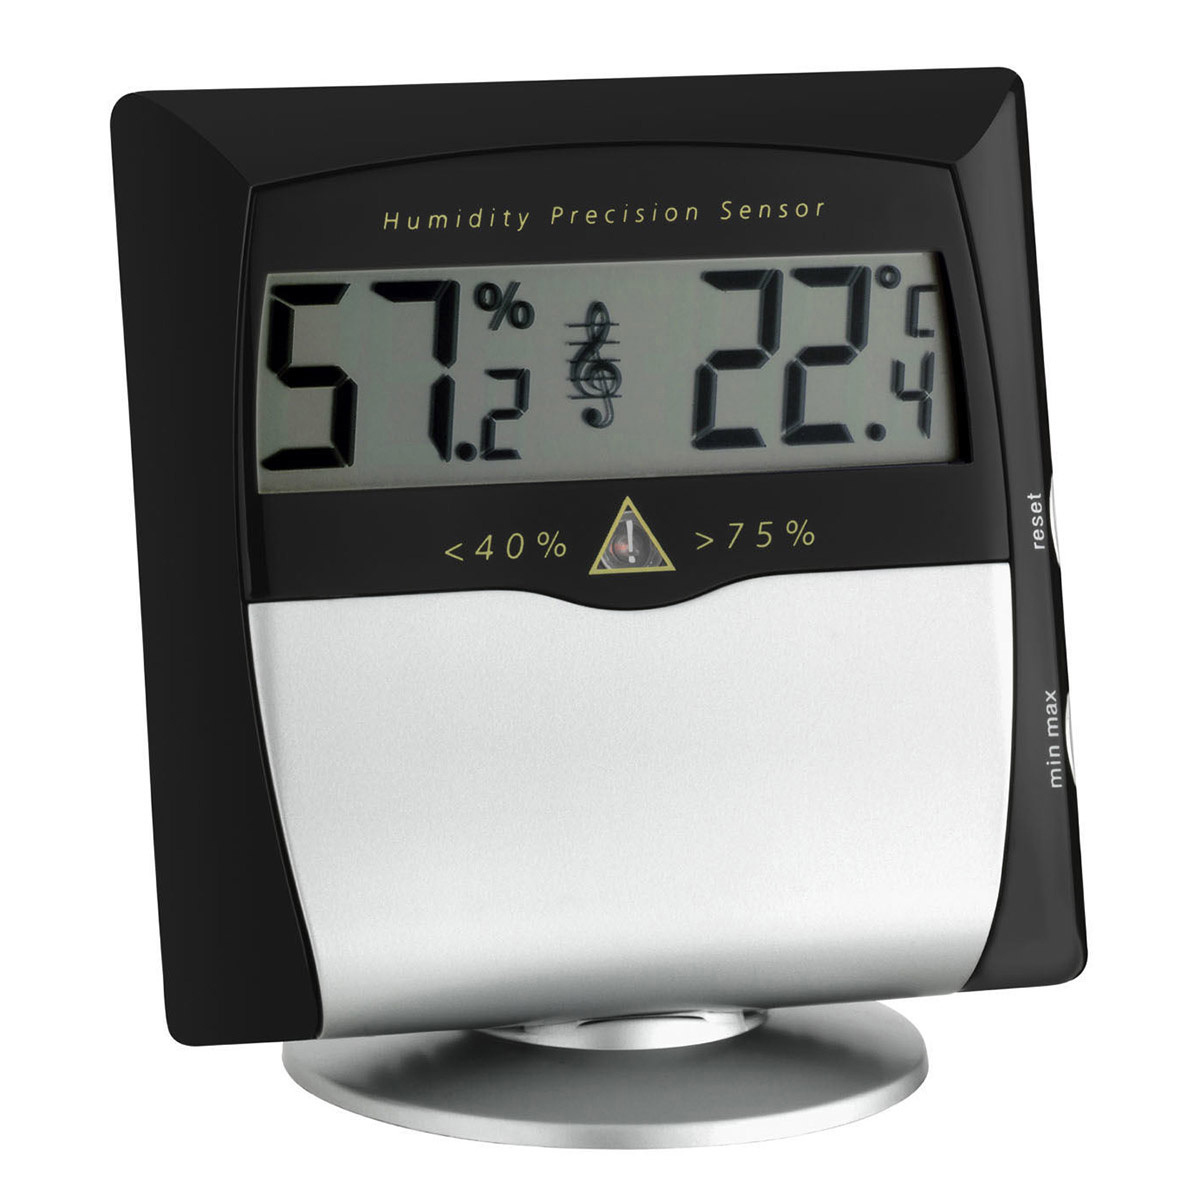 30-5009-digitales-thermo-hygrometer-musicontrol-1200x1200px.jpg